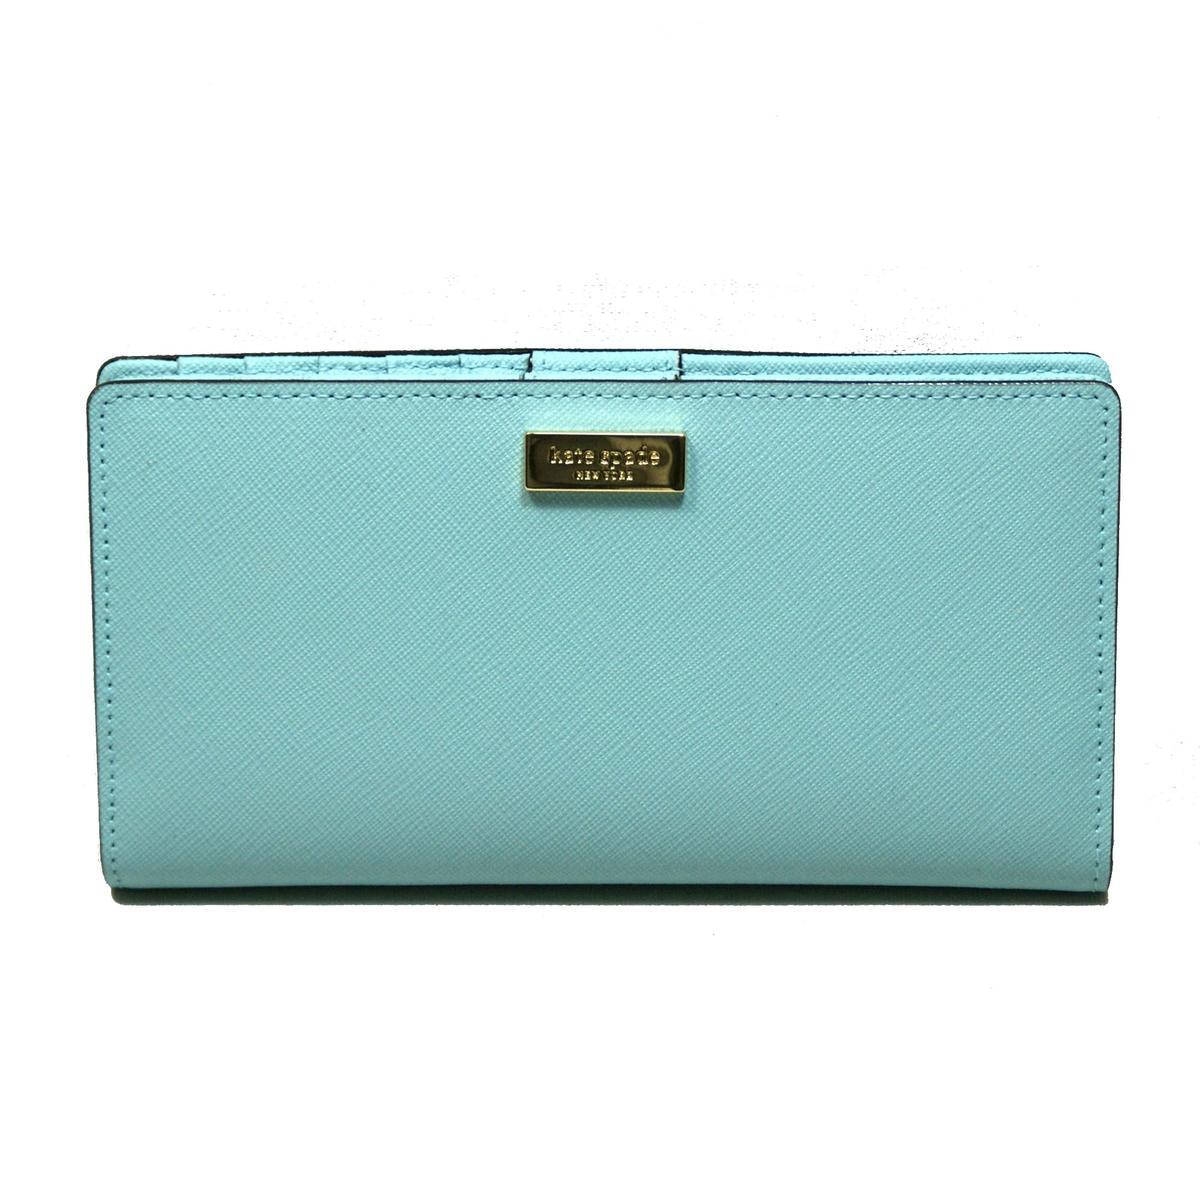 Kate Spade Light Blue Wallet